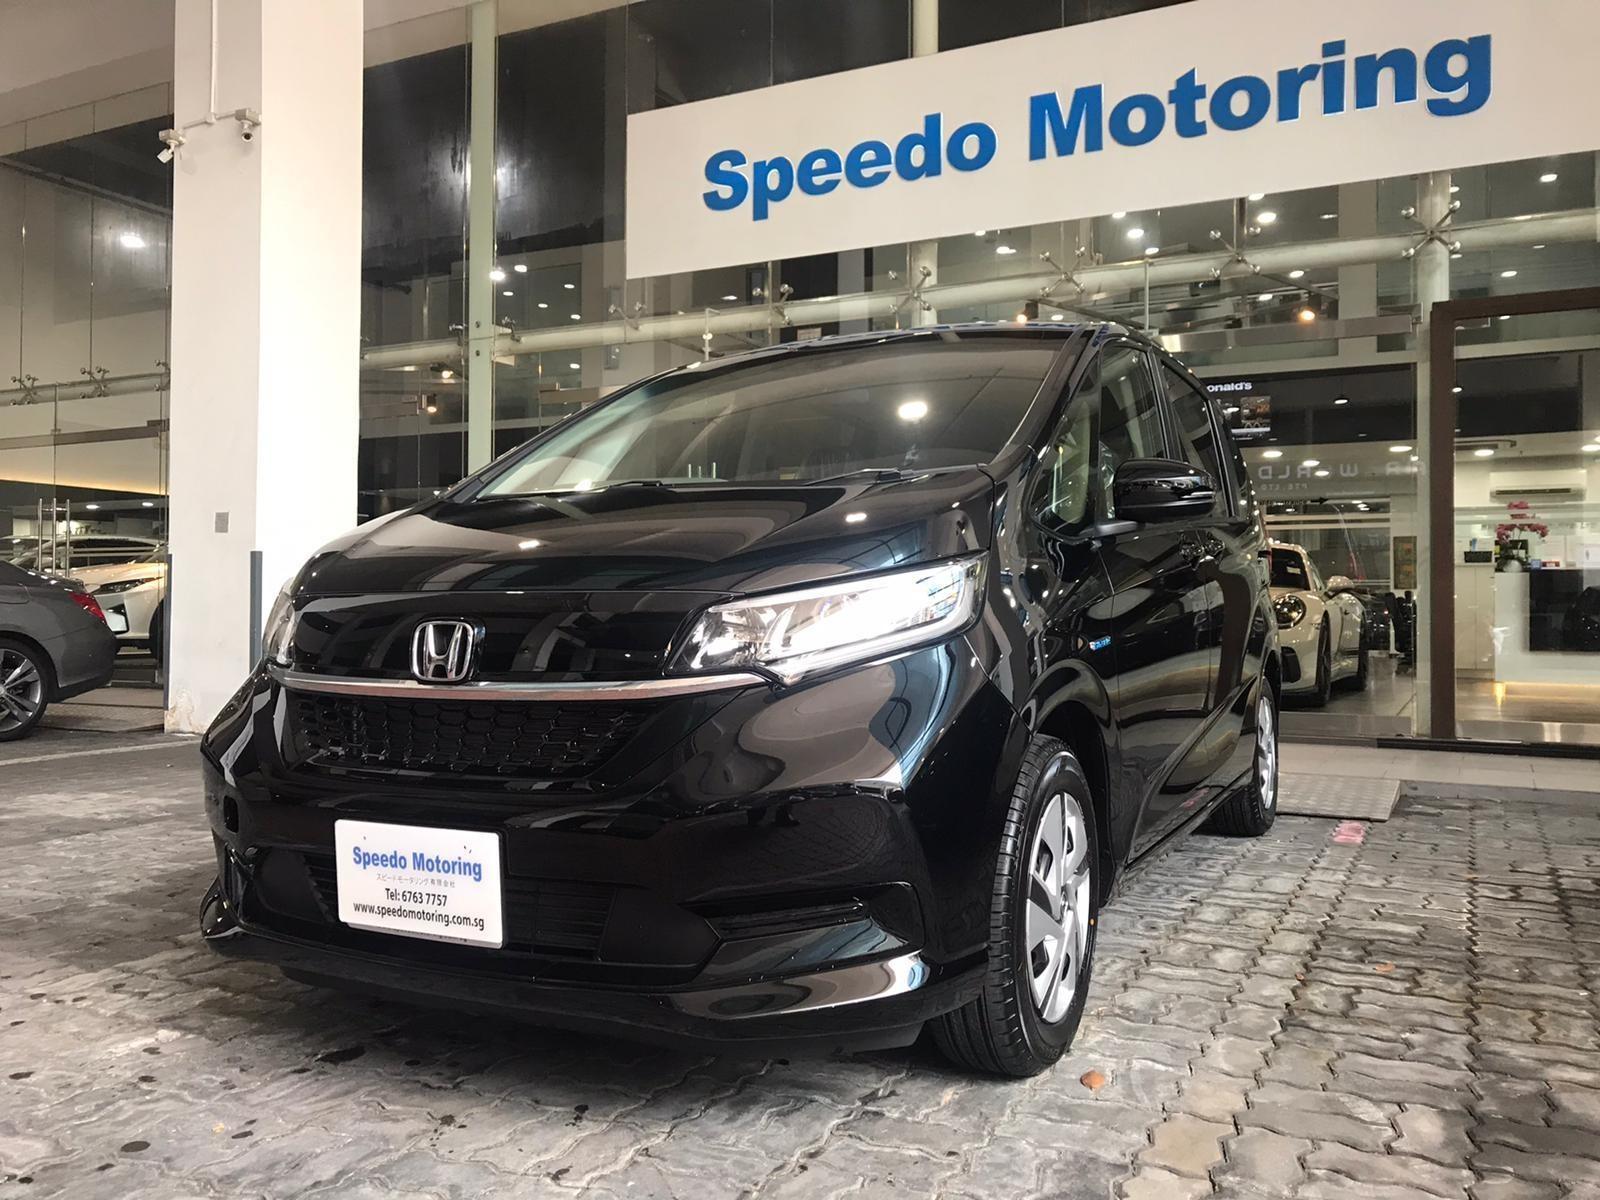 Honda Freed Hybrid 1.5 G 7-Seater Honda Sensing (A)